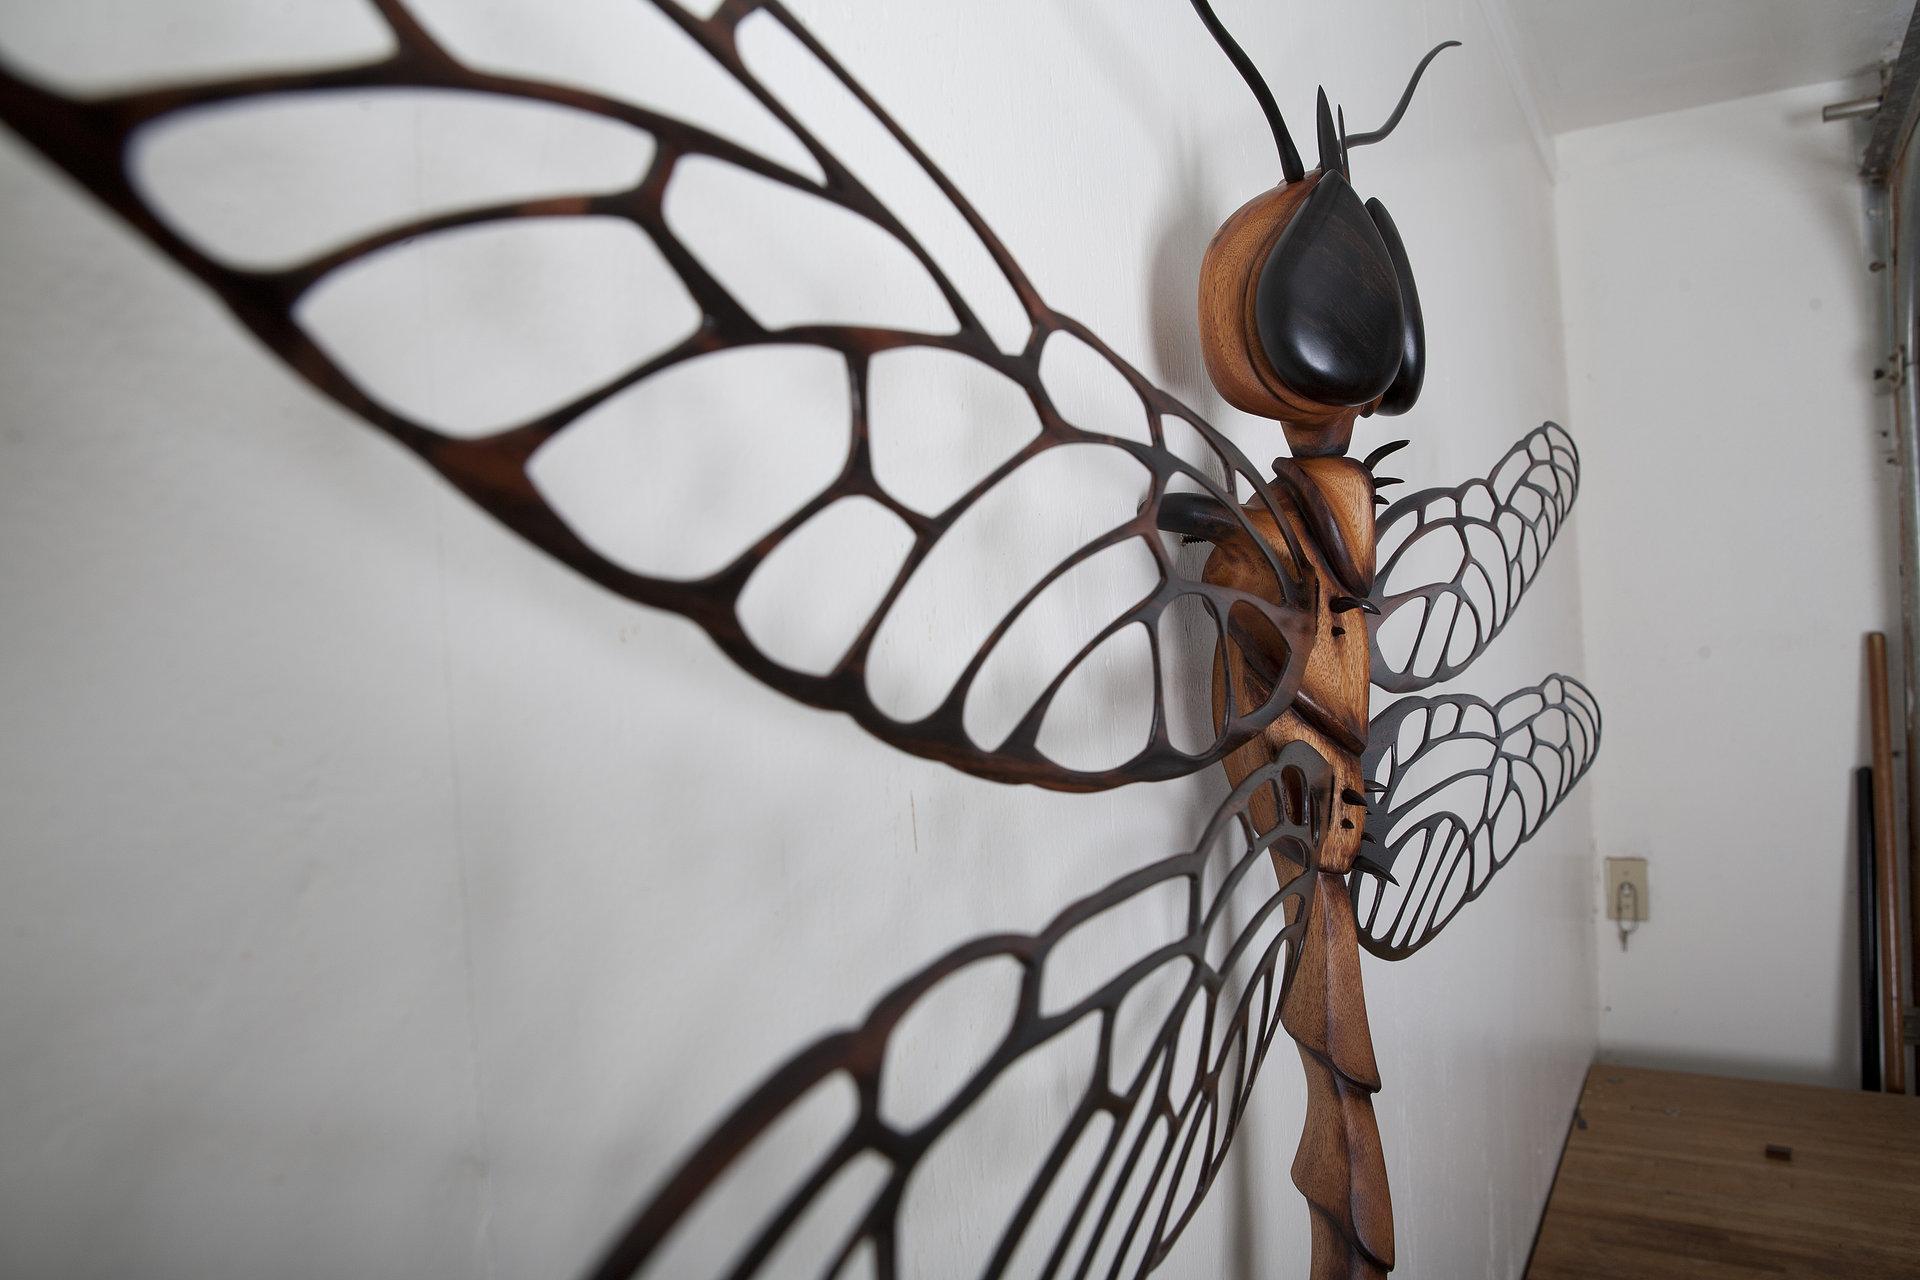 Wooden Dragonfly Sculpture